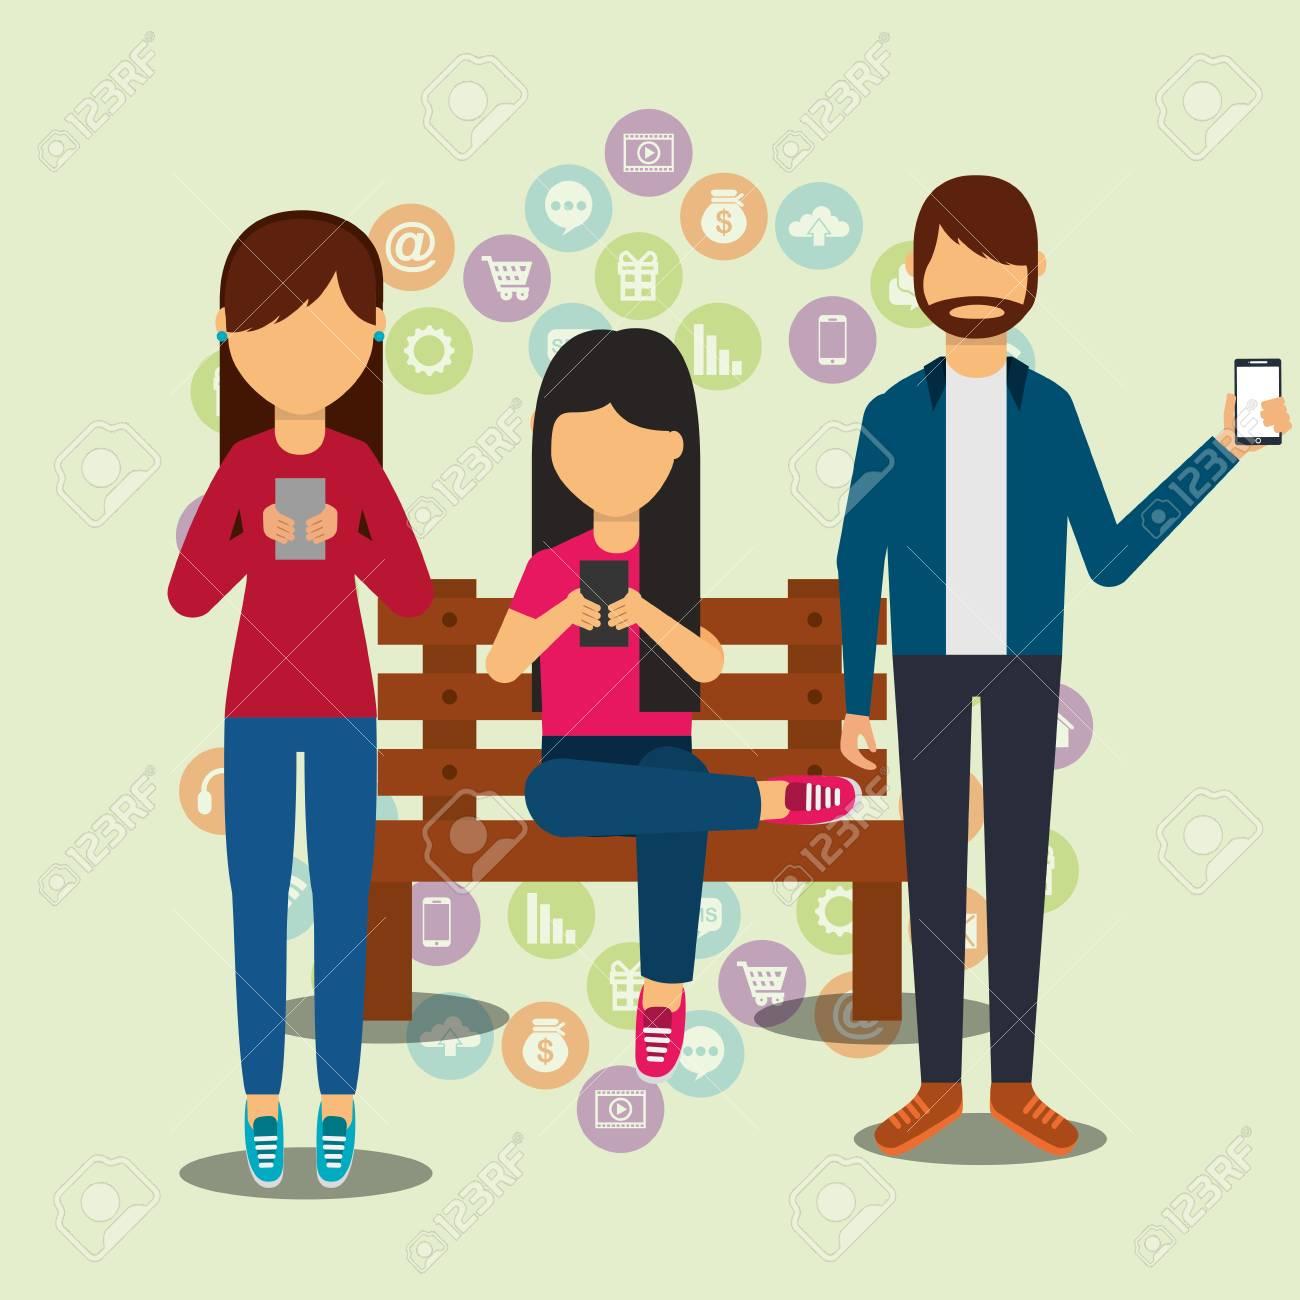 people social media user smartphones technology digital vector illustration - 99749322